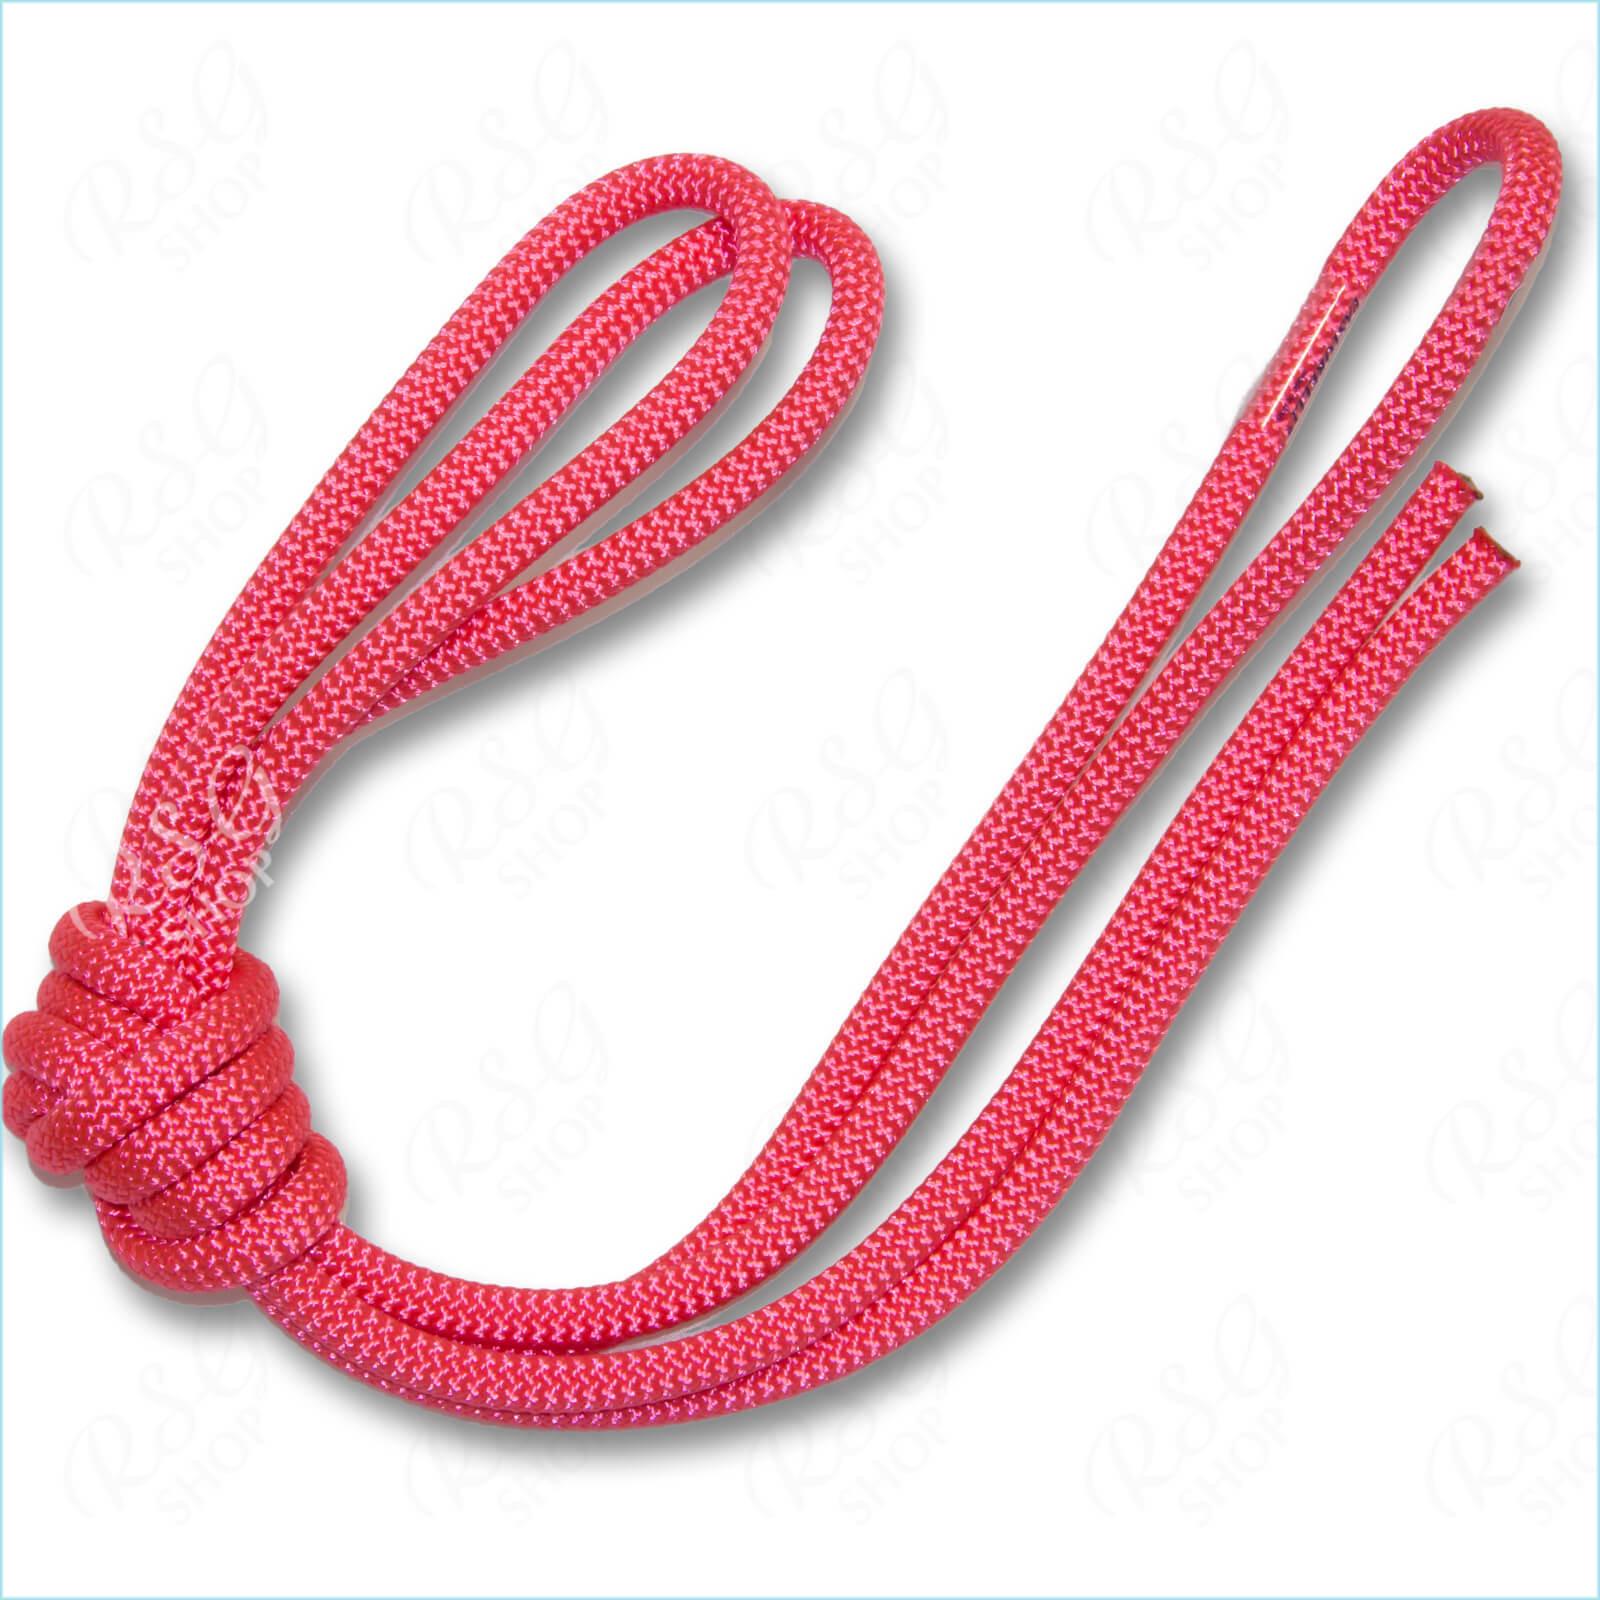 Skakalka-Rope-Pastorelli-02715